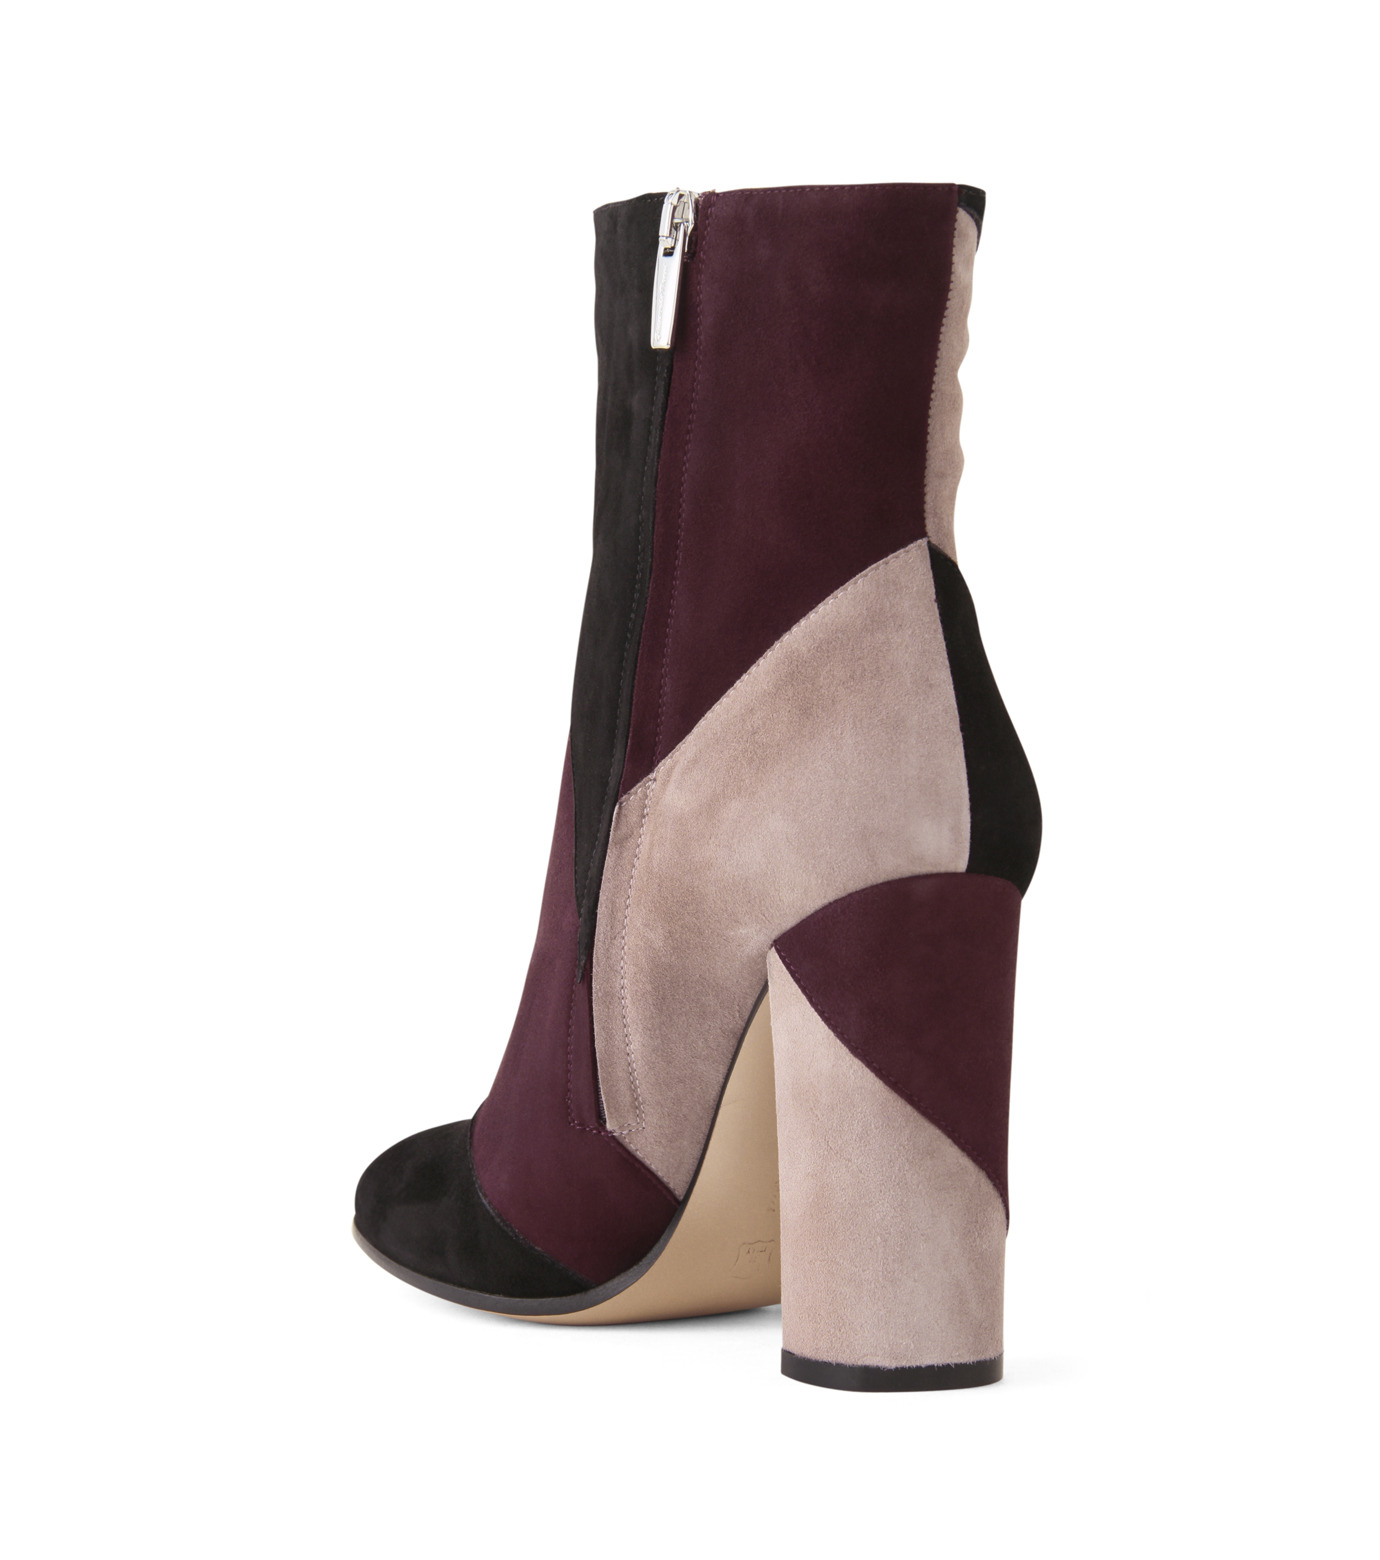 Gianvito Rossi(ジャンヴィト ロッシ)のPatchwork Bootie-BORDEAUX(ブーツ/boots)-G70625-63 拡大詳細画像2